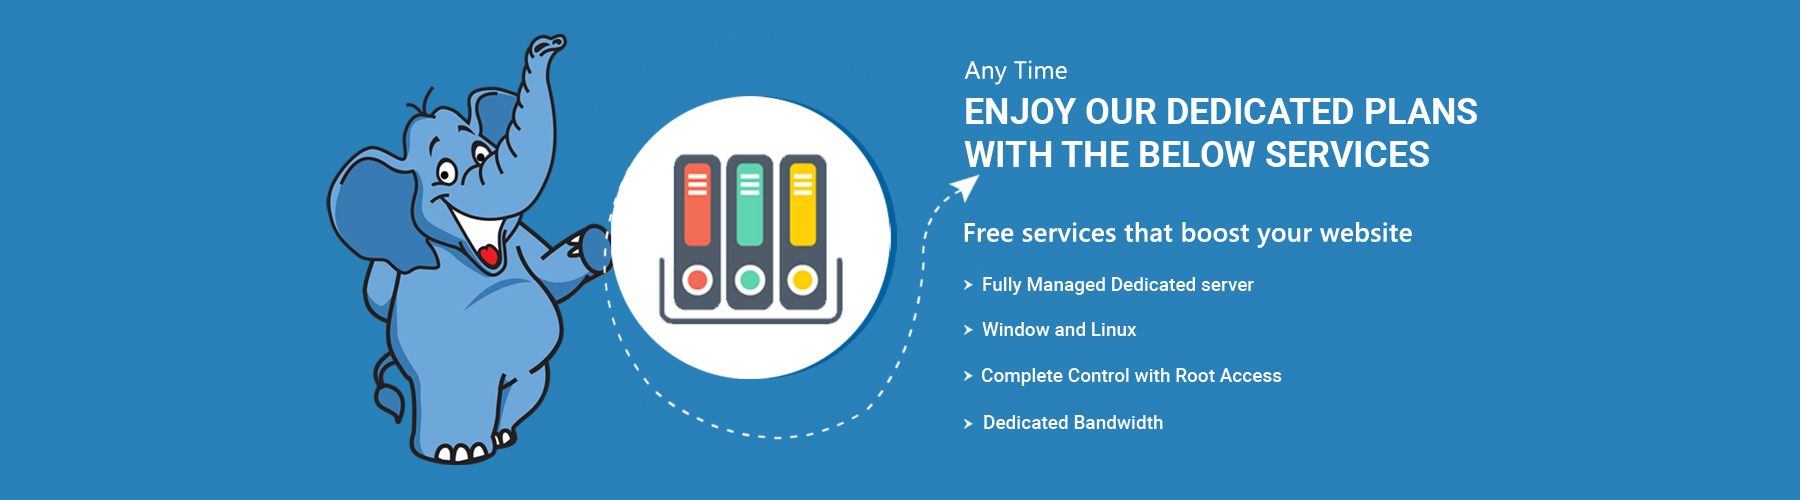 VPS Hosting India - Best VPS Server   Webhostingbingo - IssueWire